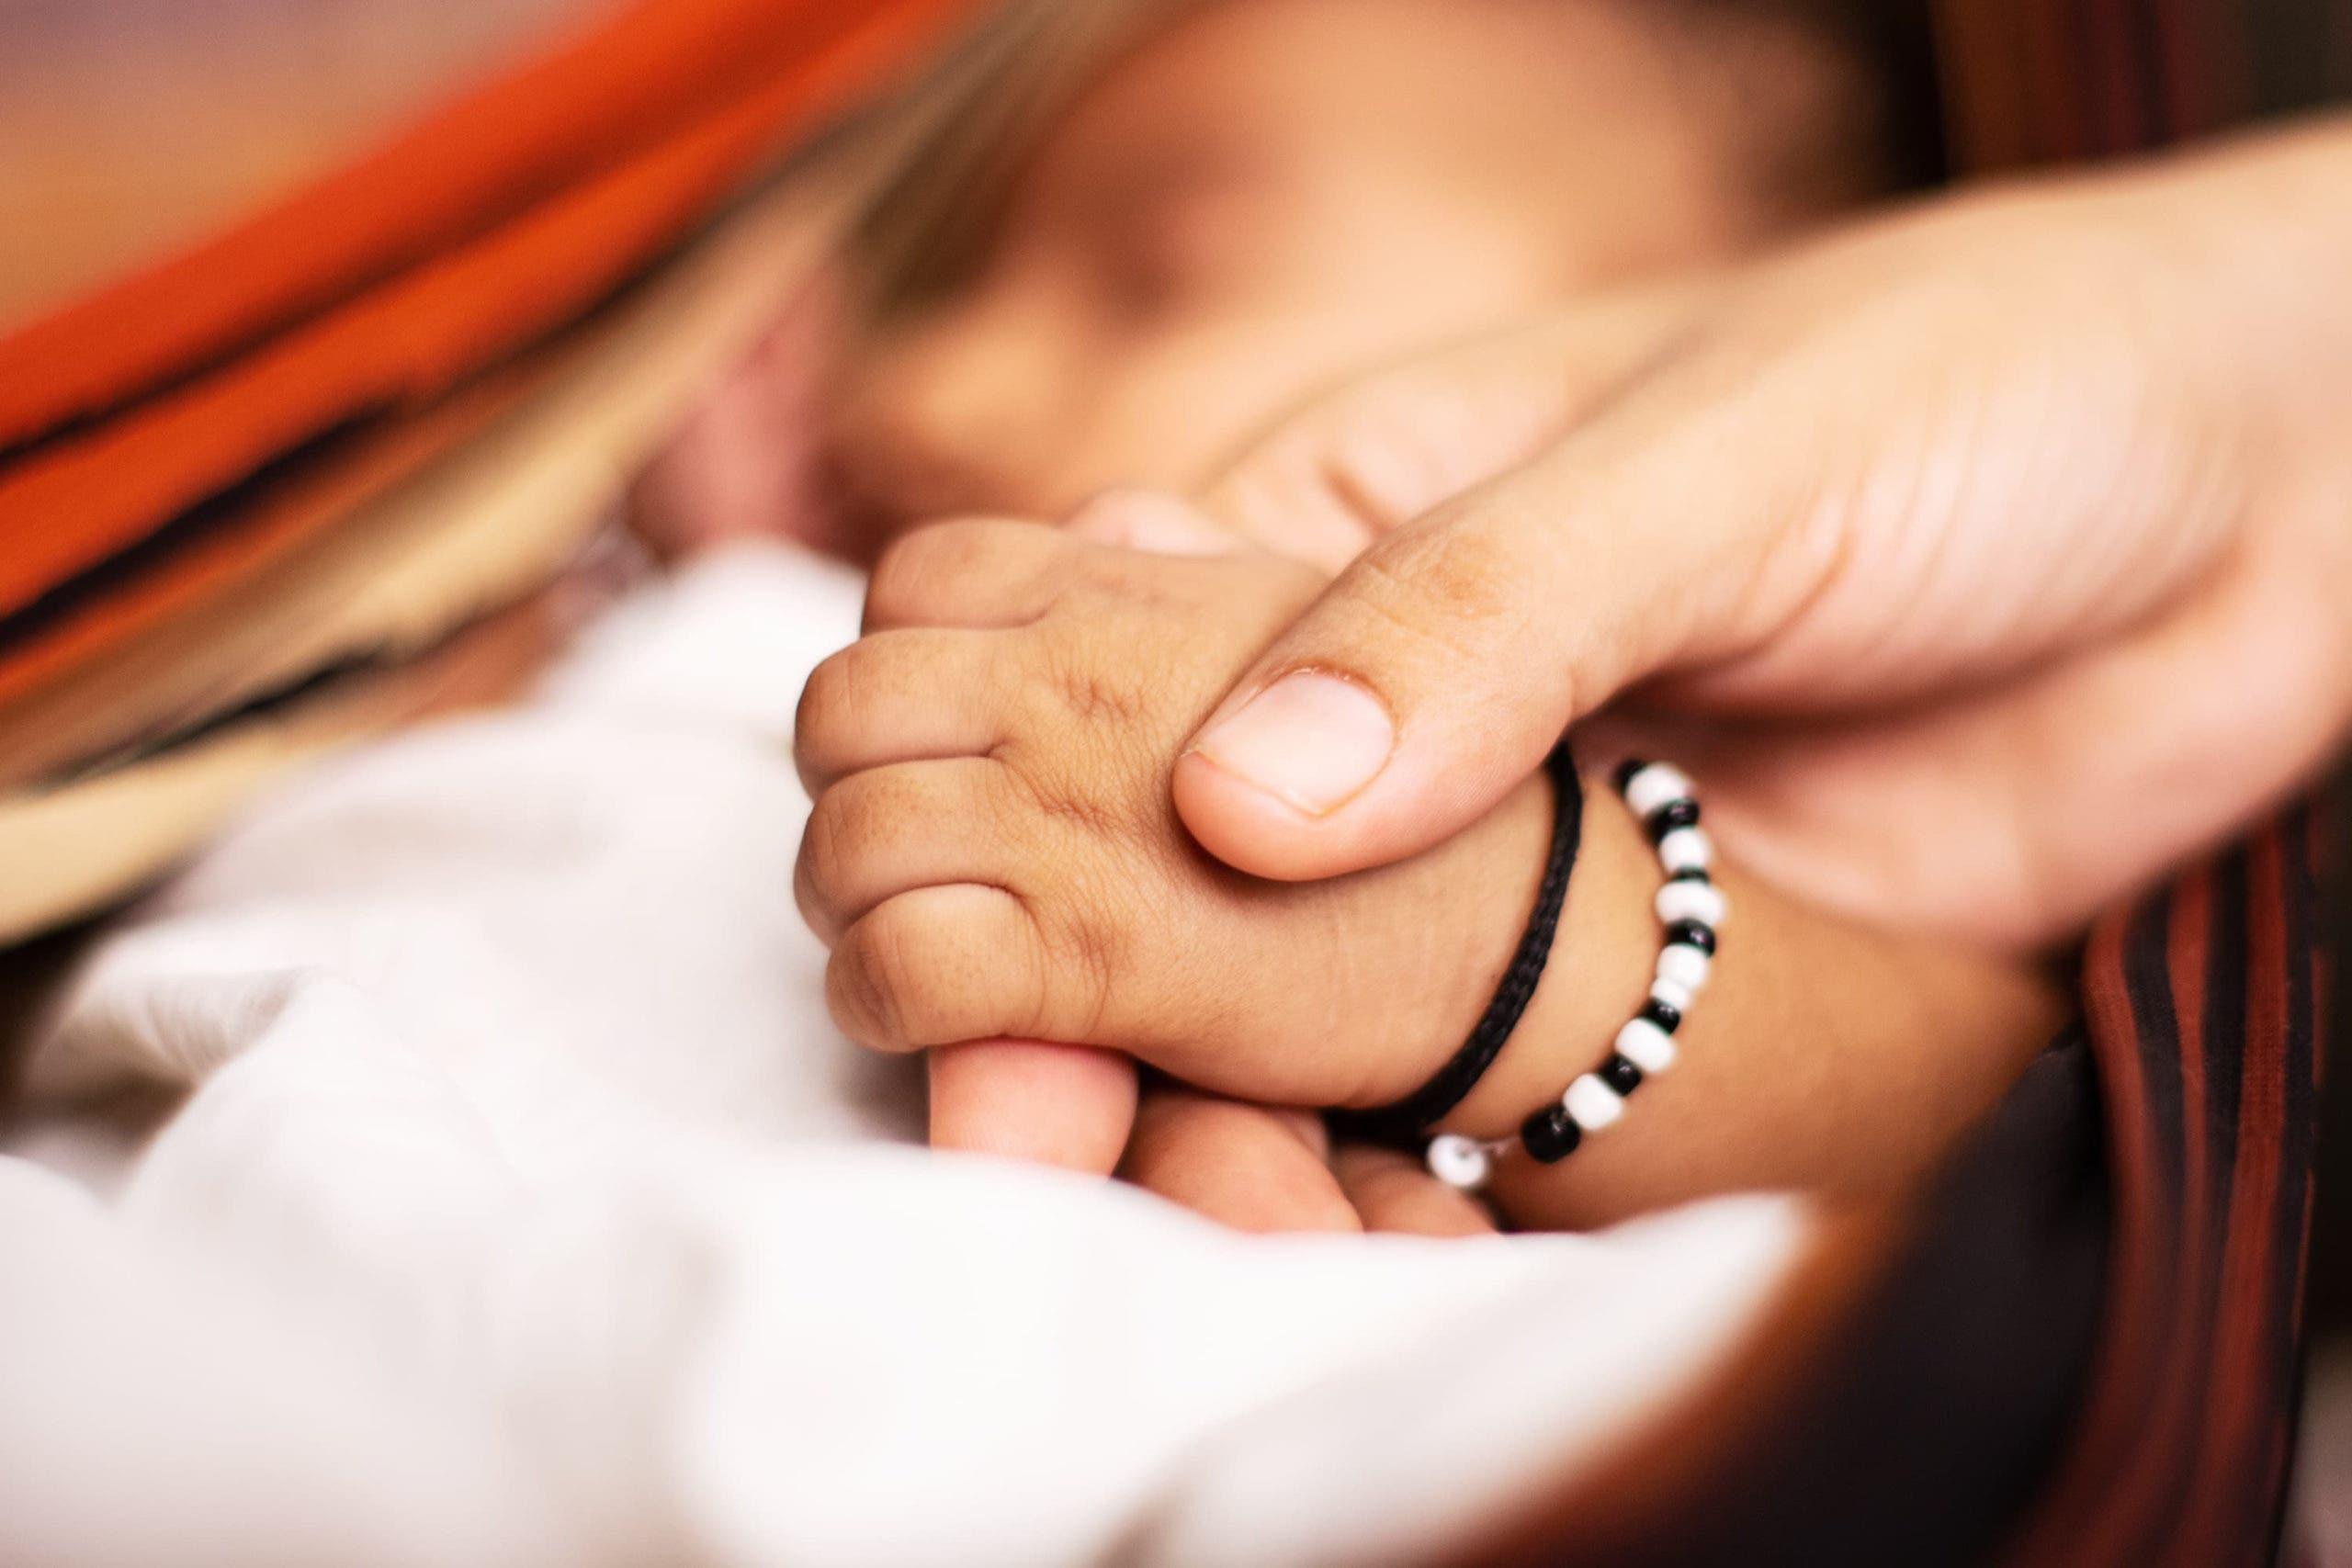 mains de bébé